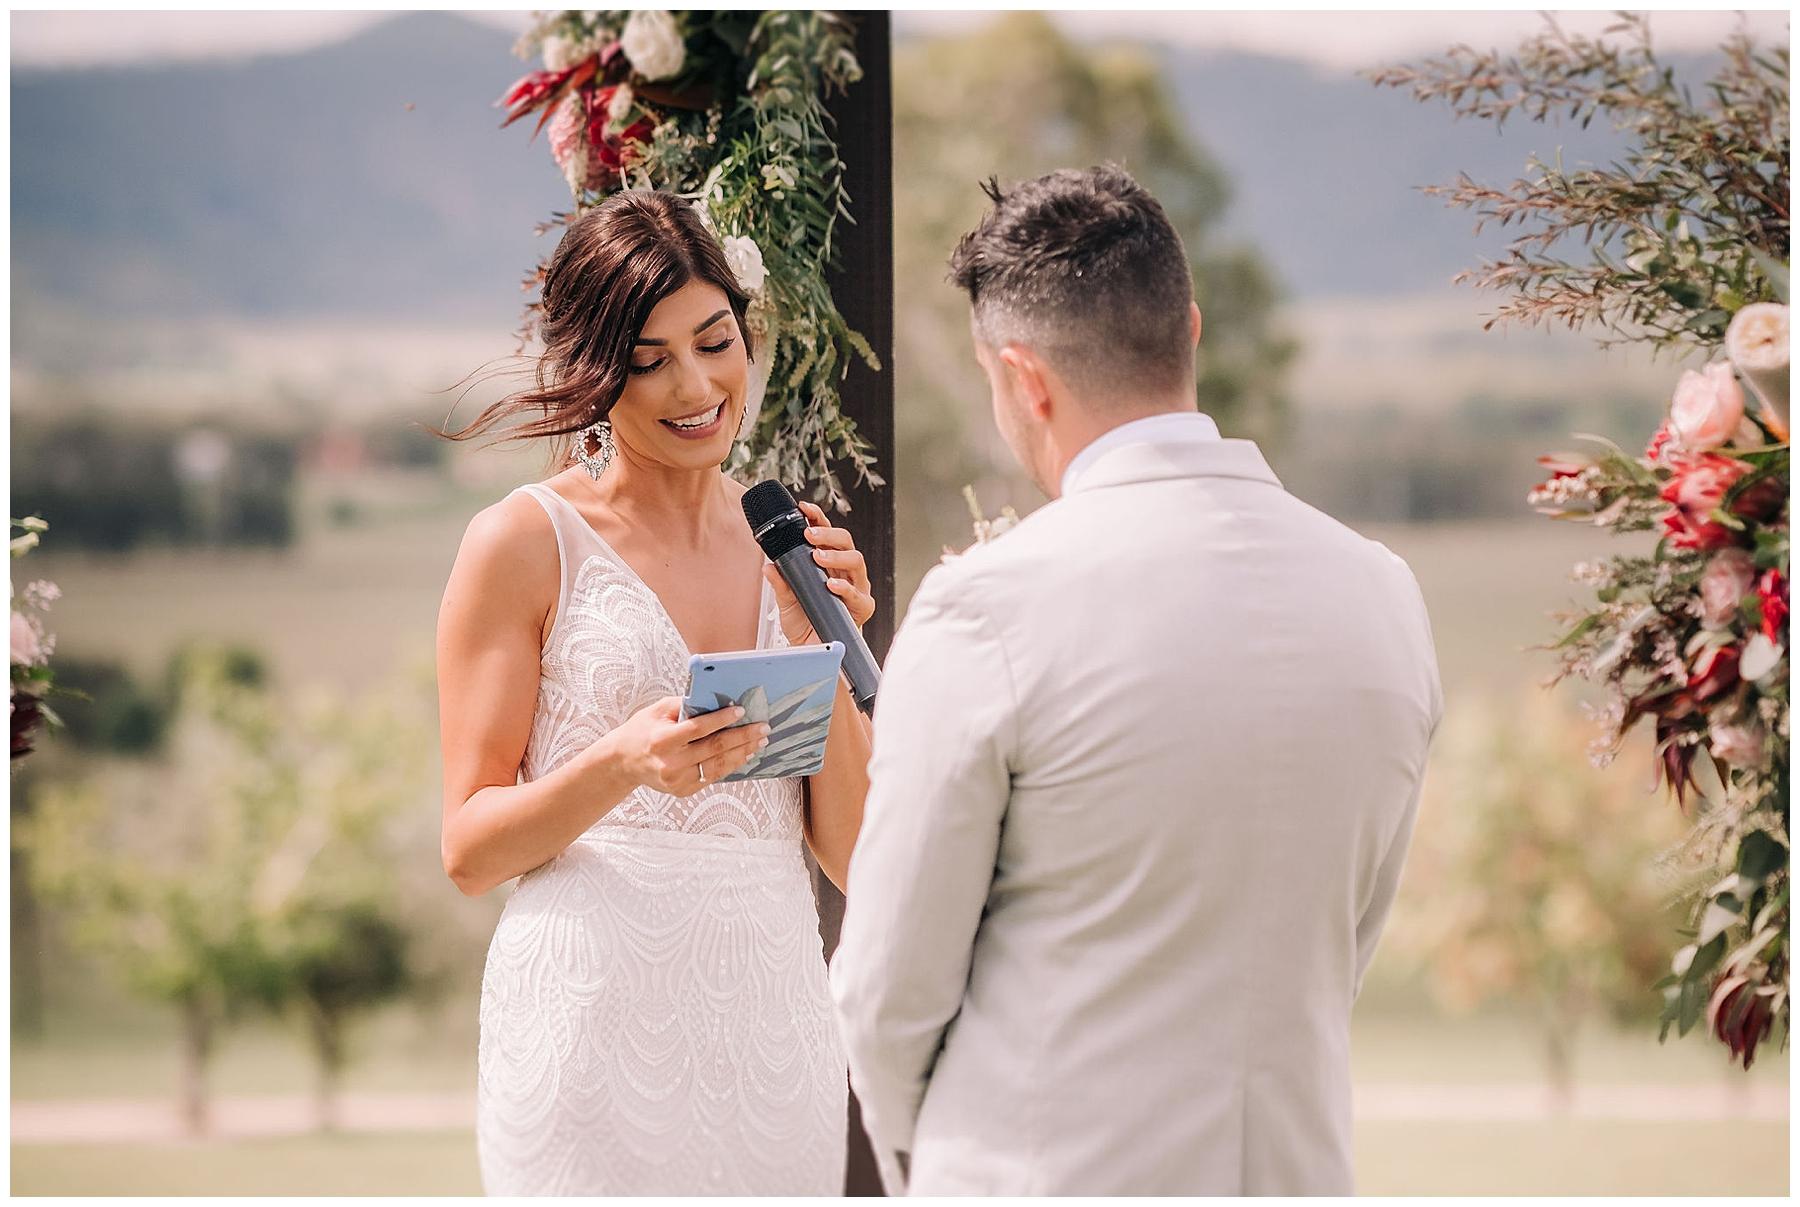 Adam's Peak Wedding Photos + Popcorn Photography_0028.jpg